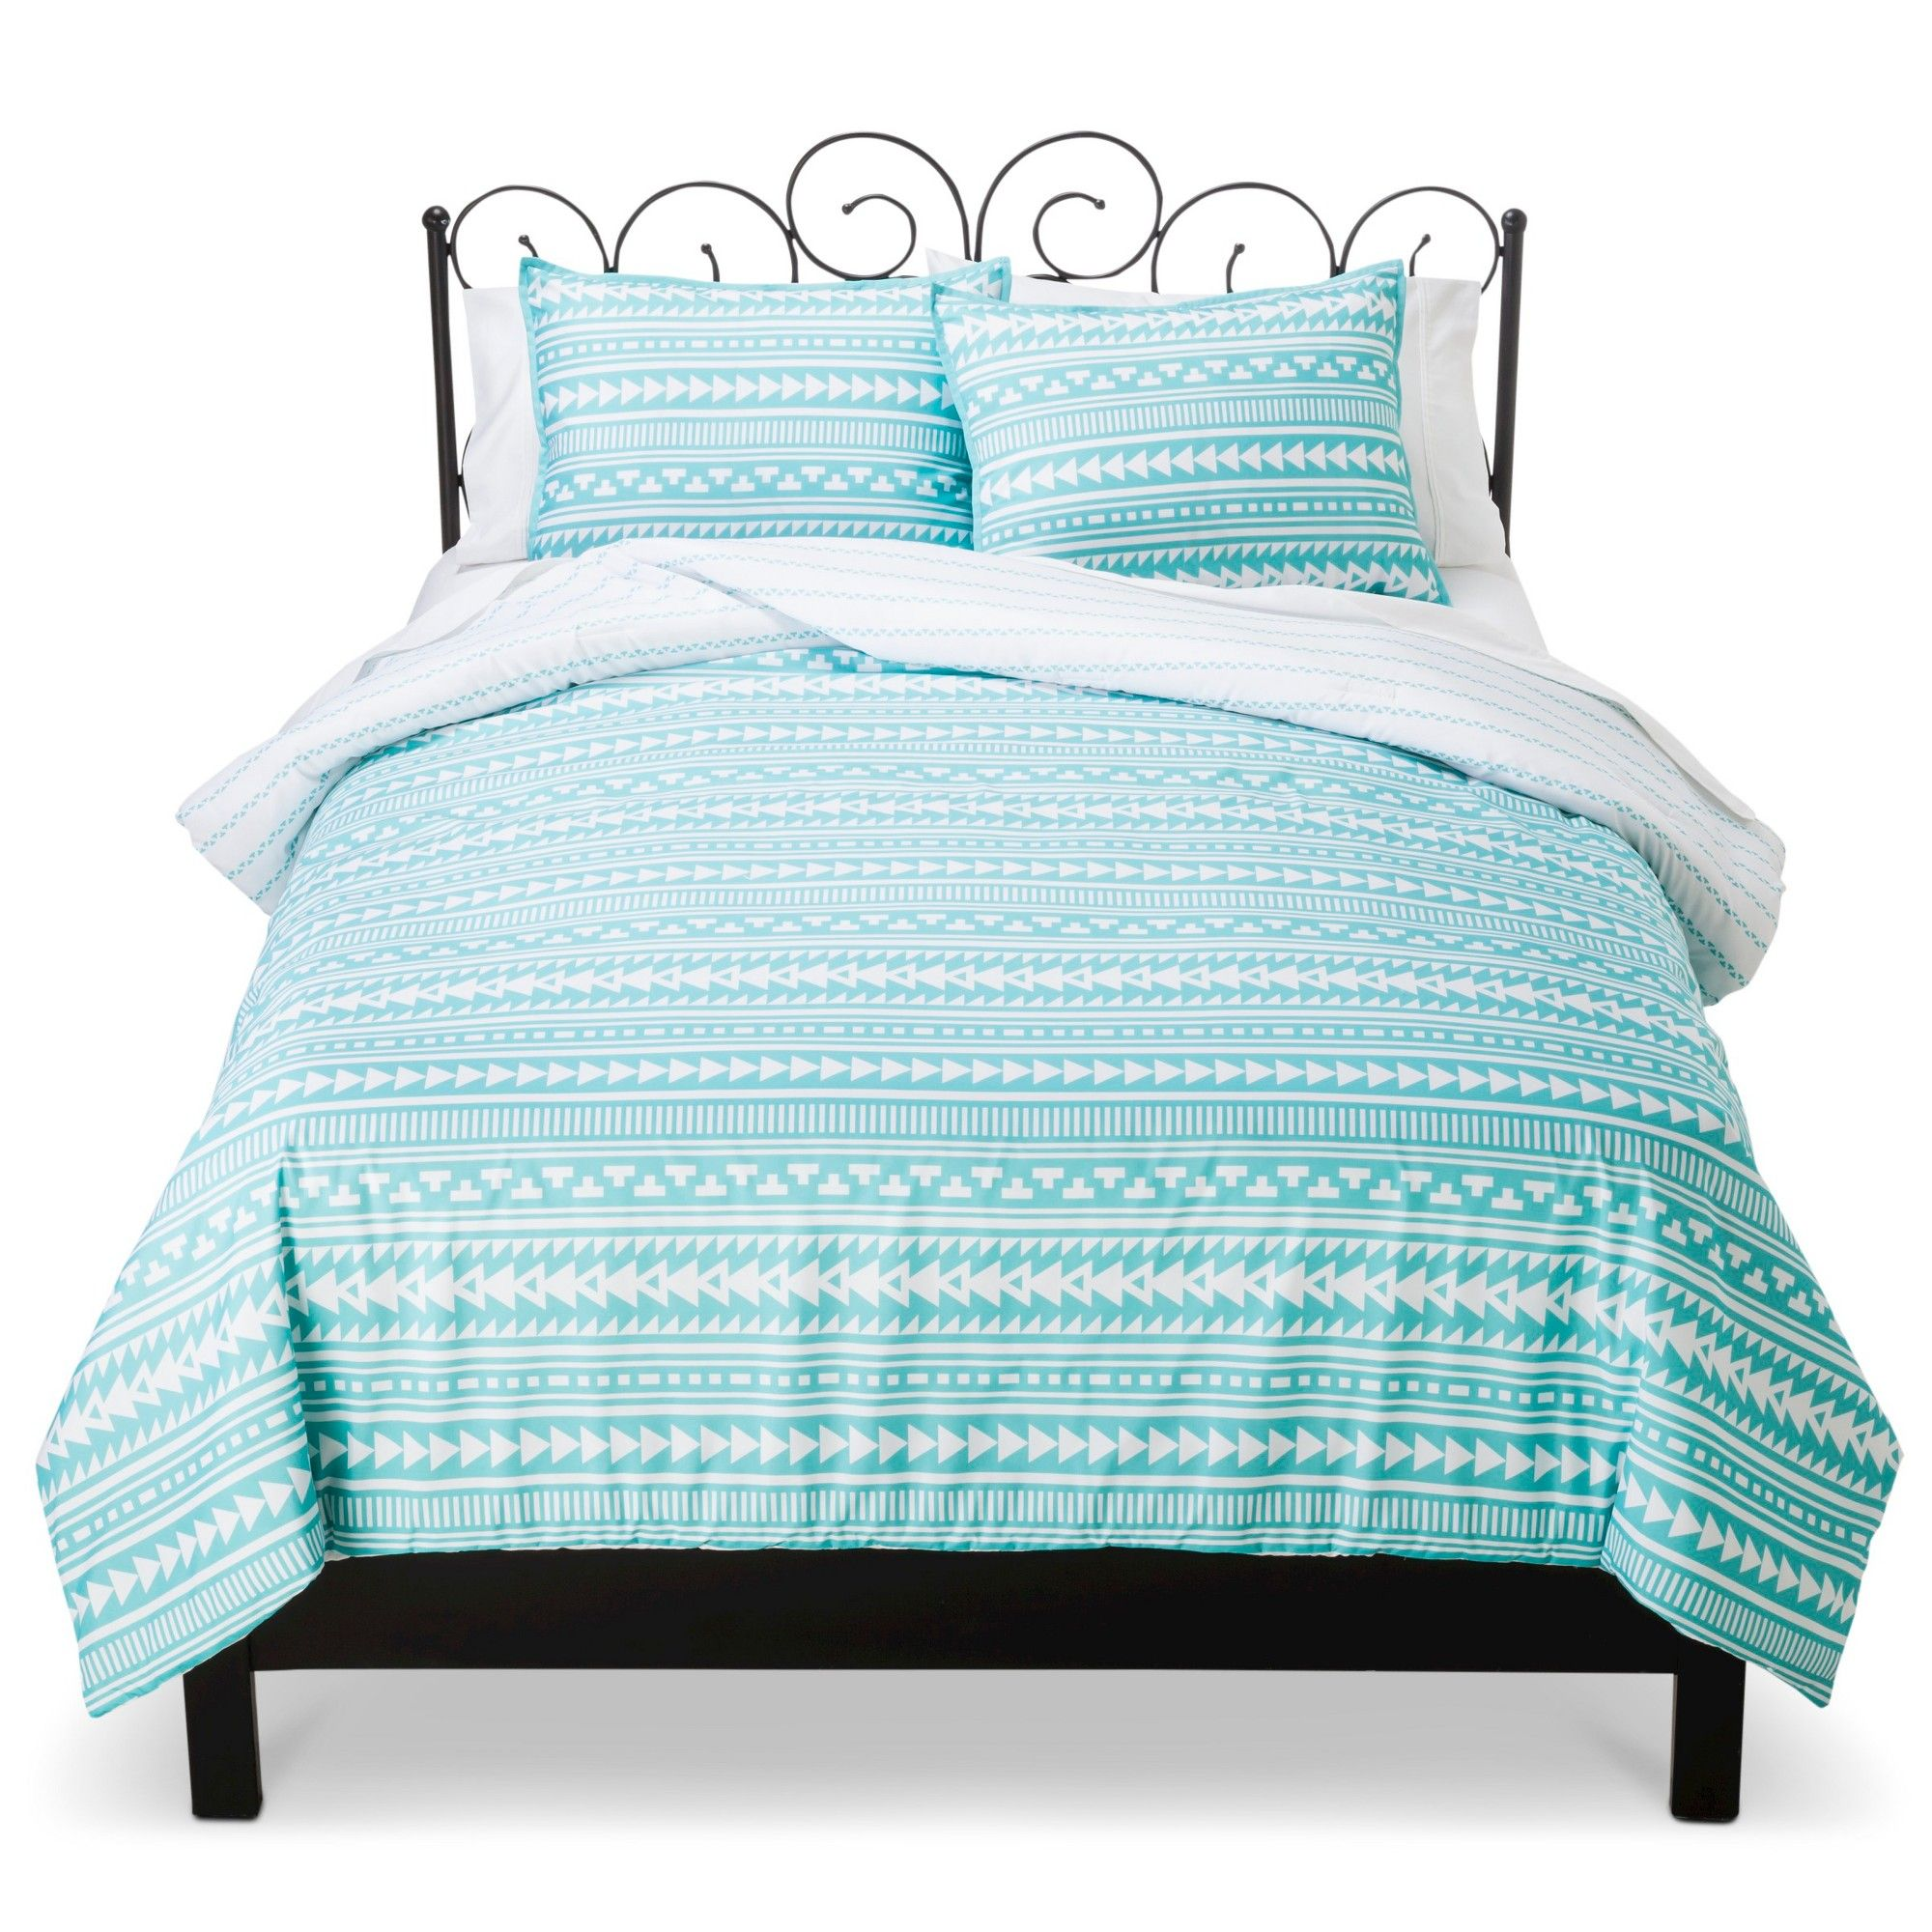 sheets xl home twin comforter amazon bath college dorm bedding dp set for red com sets black pc kitchen towels